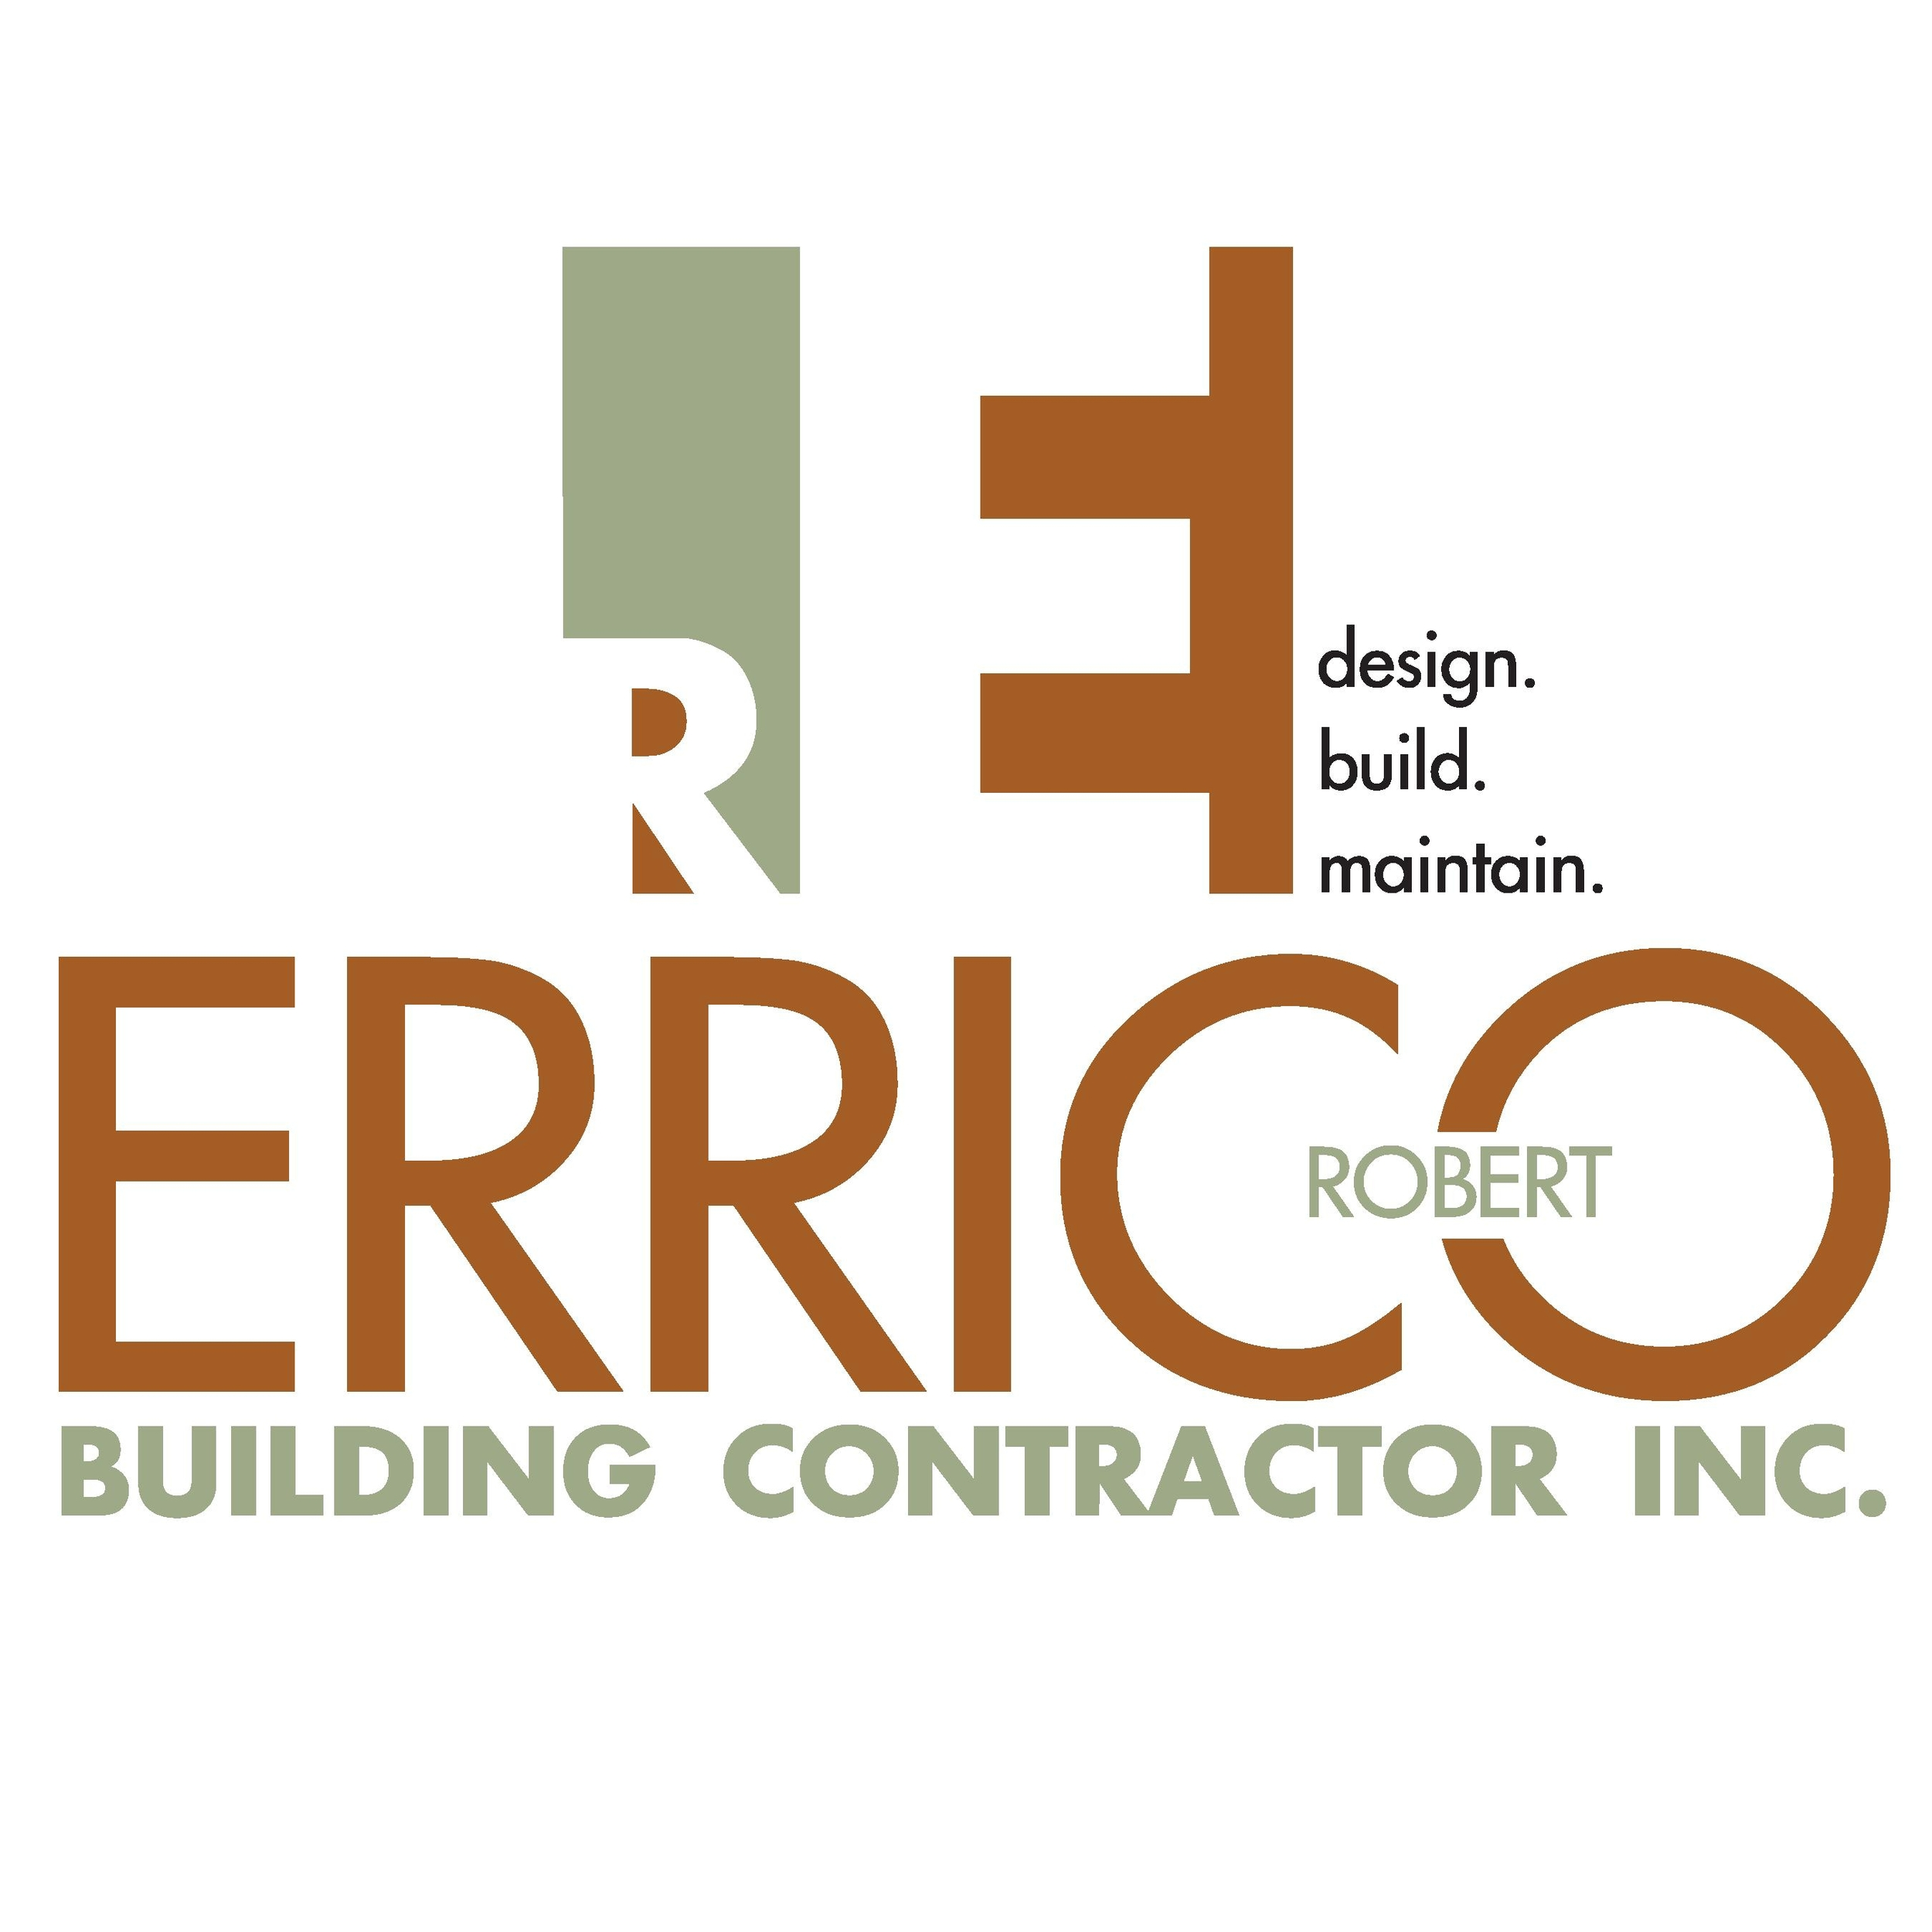 REBC logo-page-001.JPG